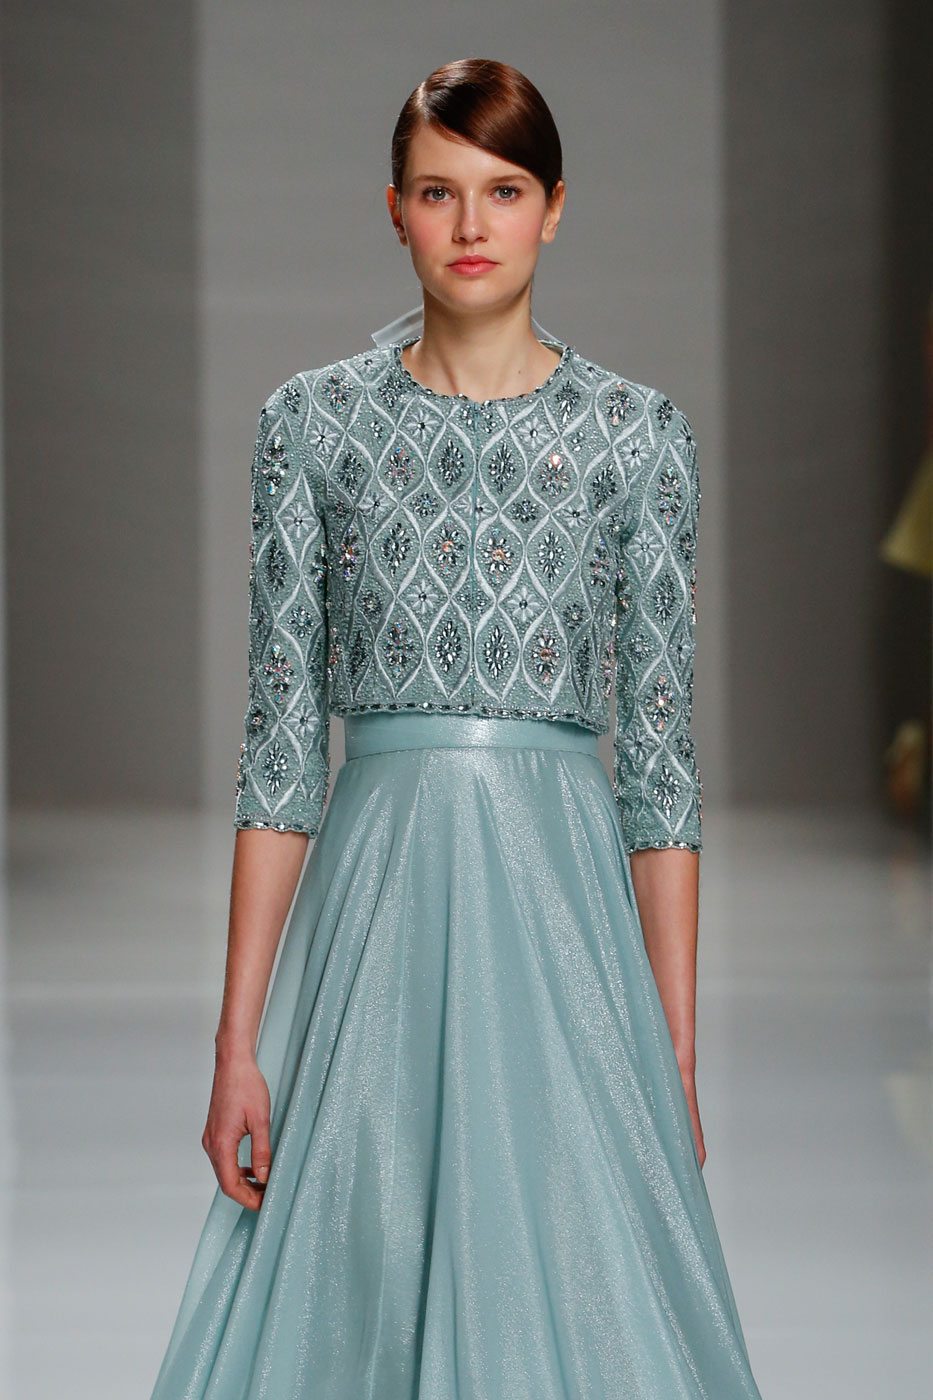 Georges-Hobeika-fashion-runway-show-haute-couture-paris-spring-2015-the-impression-20